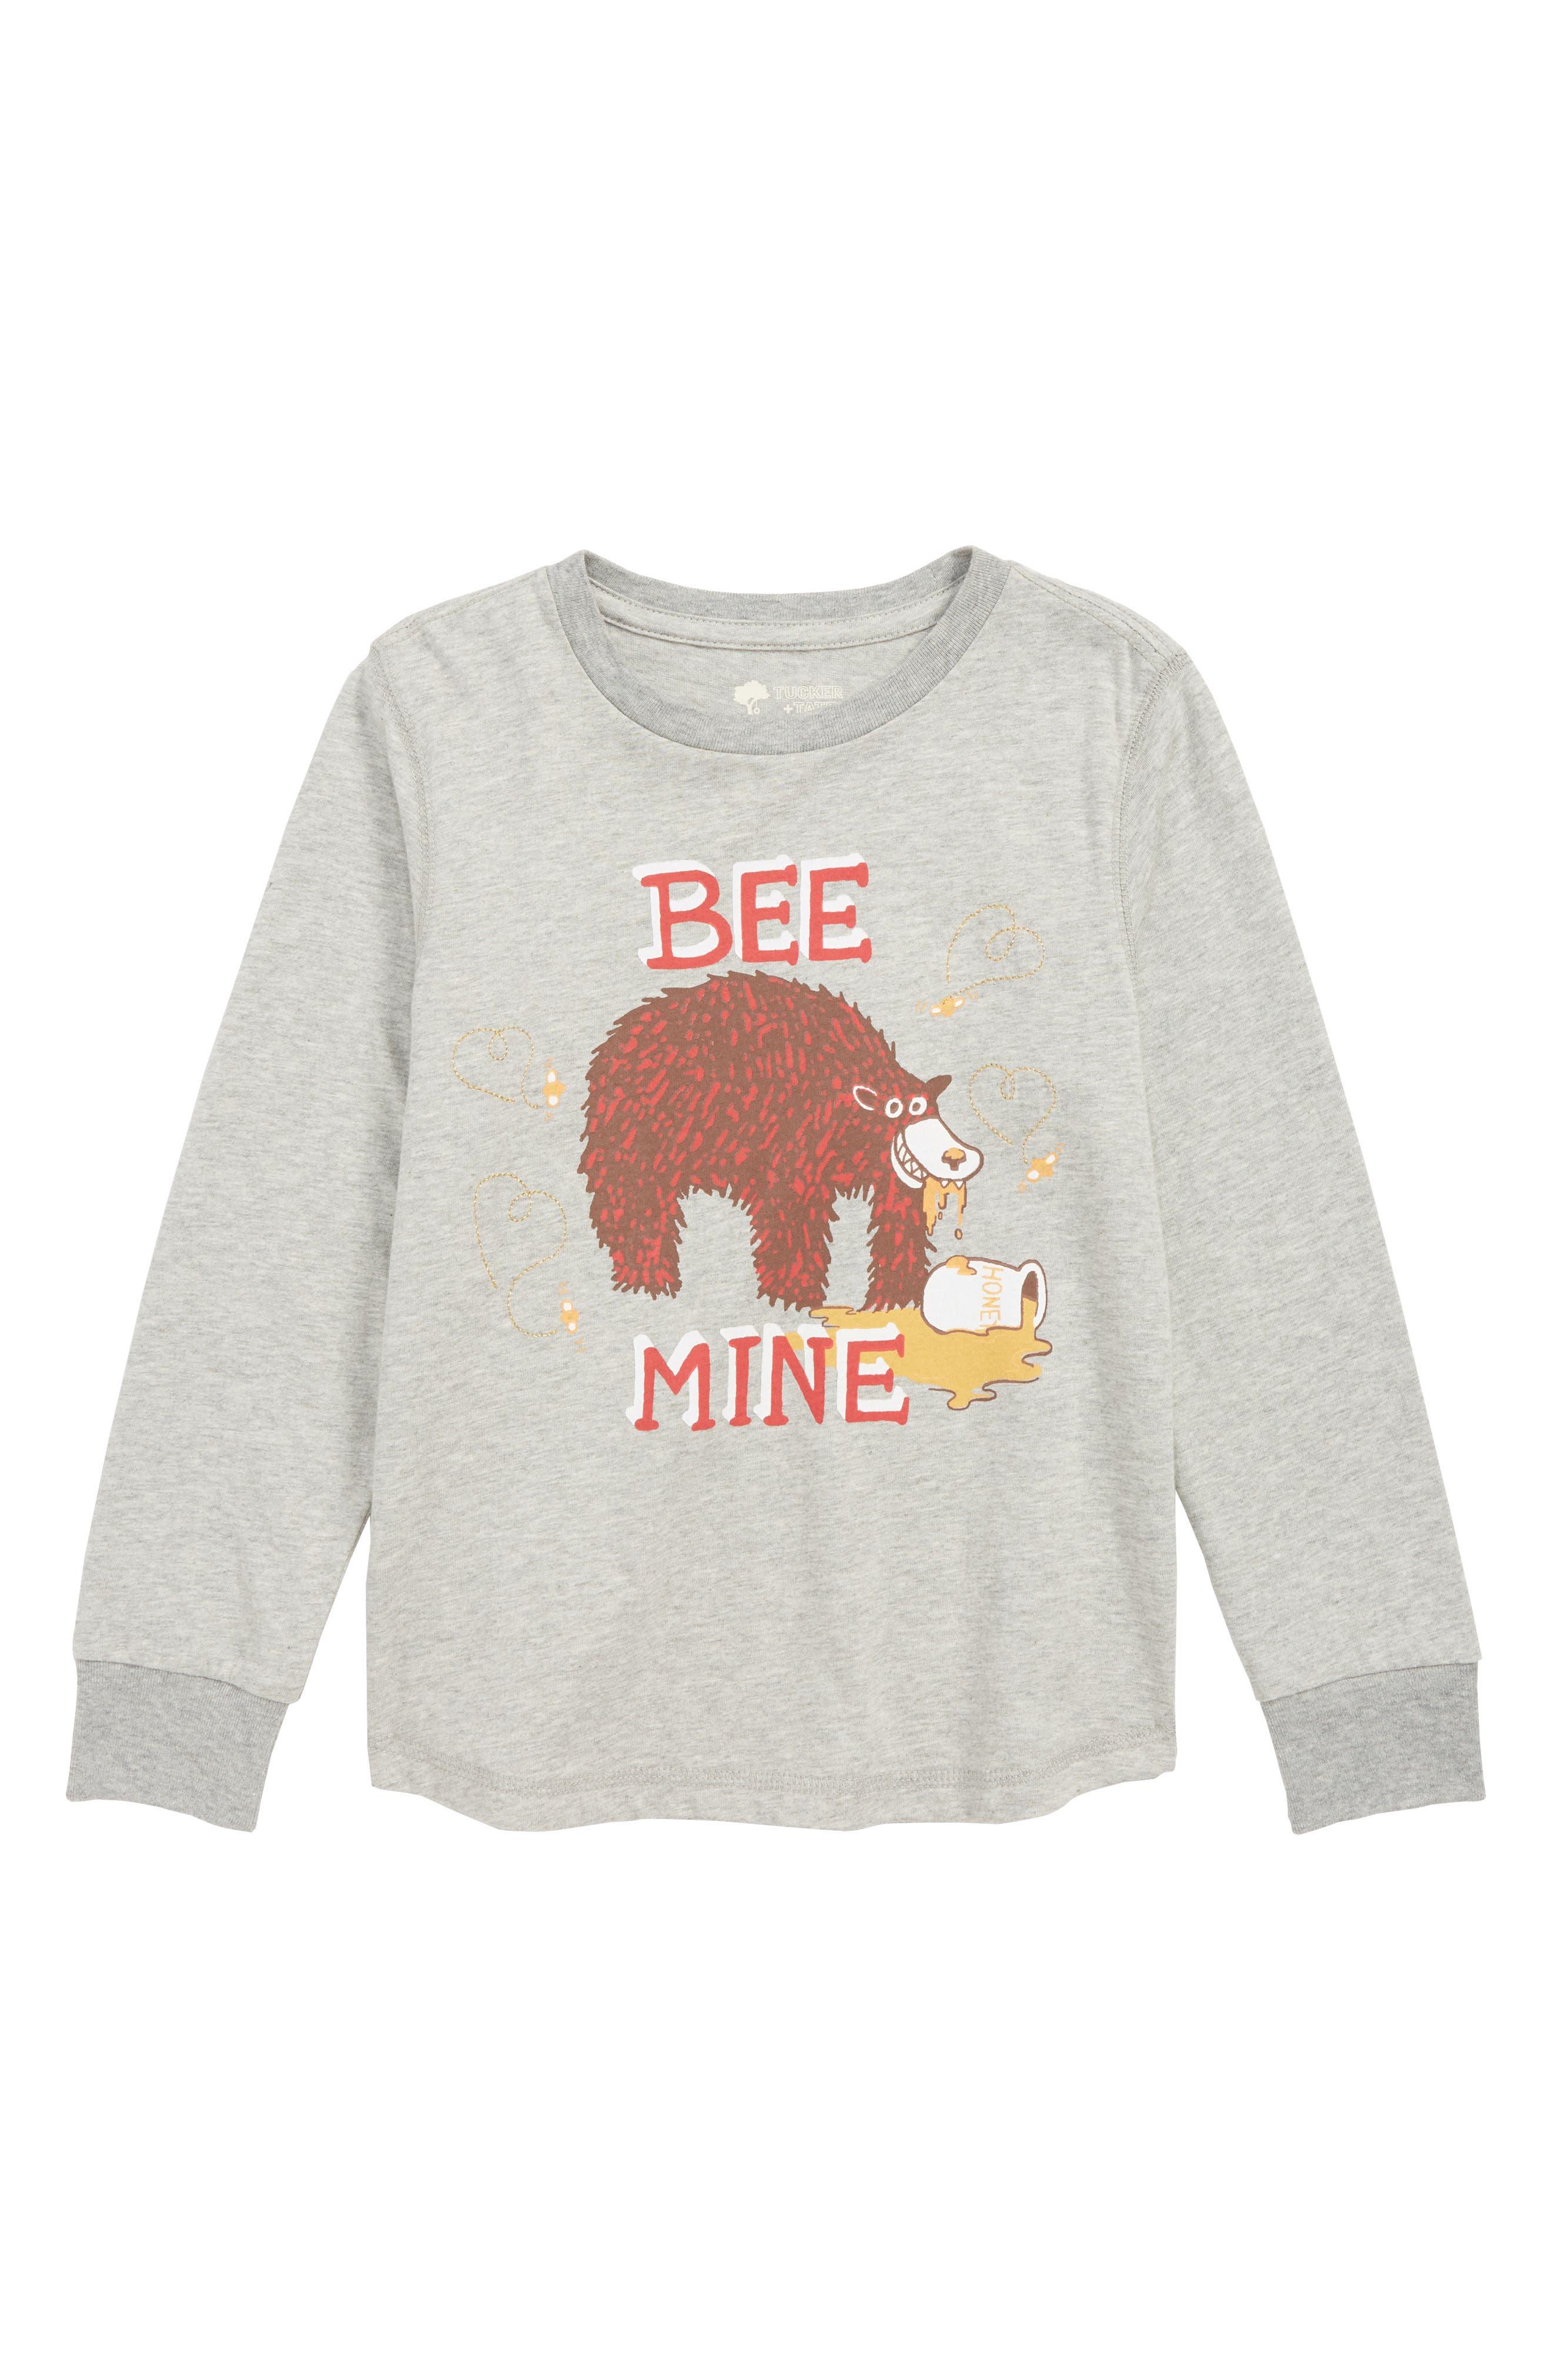 TUCKER + TATE, Graphic T-Shirt, Main thumbnail 1, color, GREY MEDIUM HEATHER BEE MINE